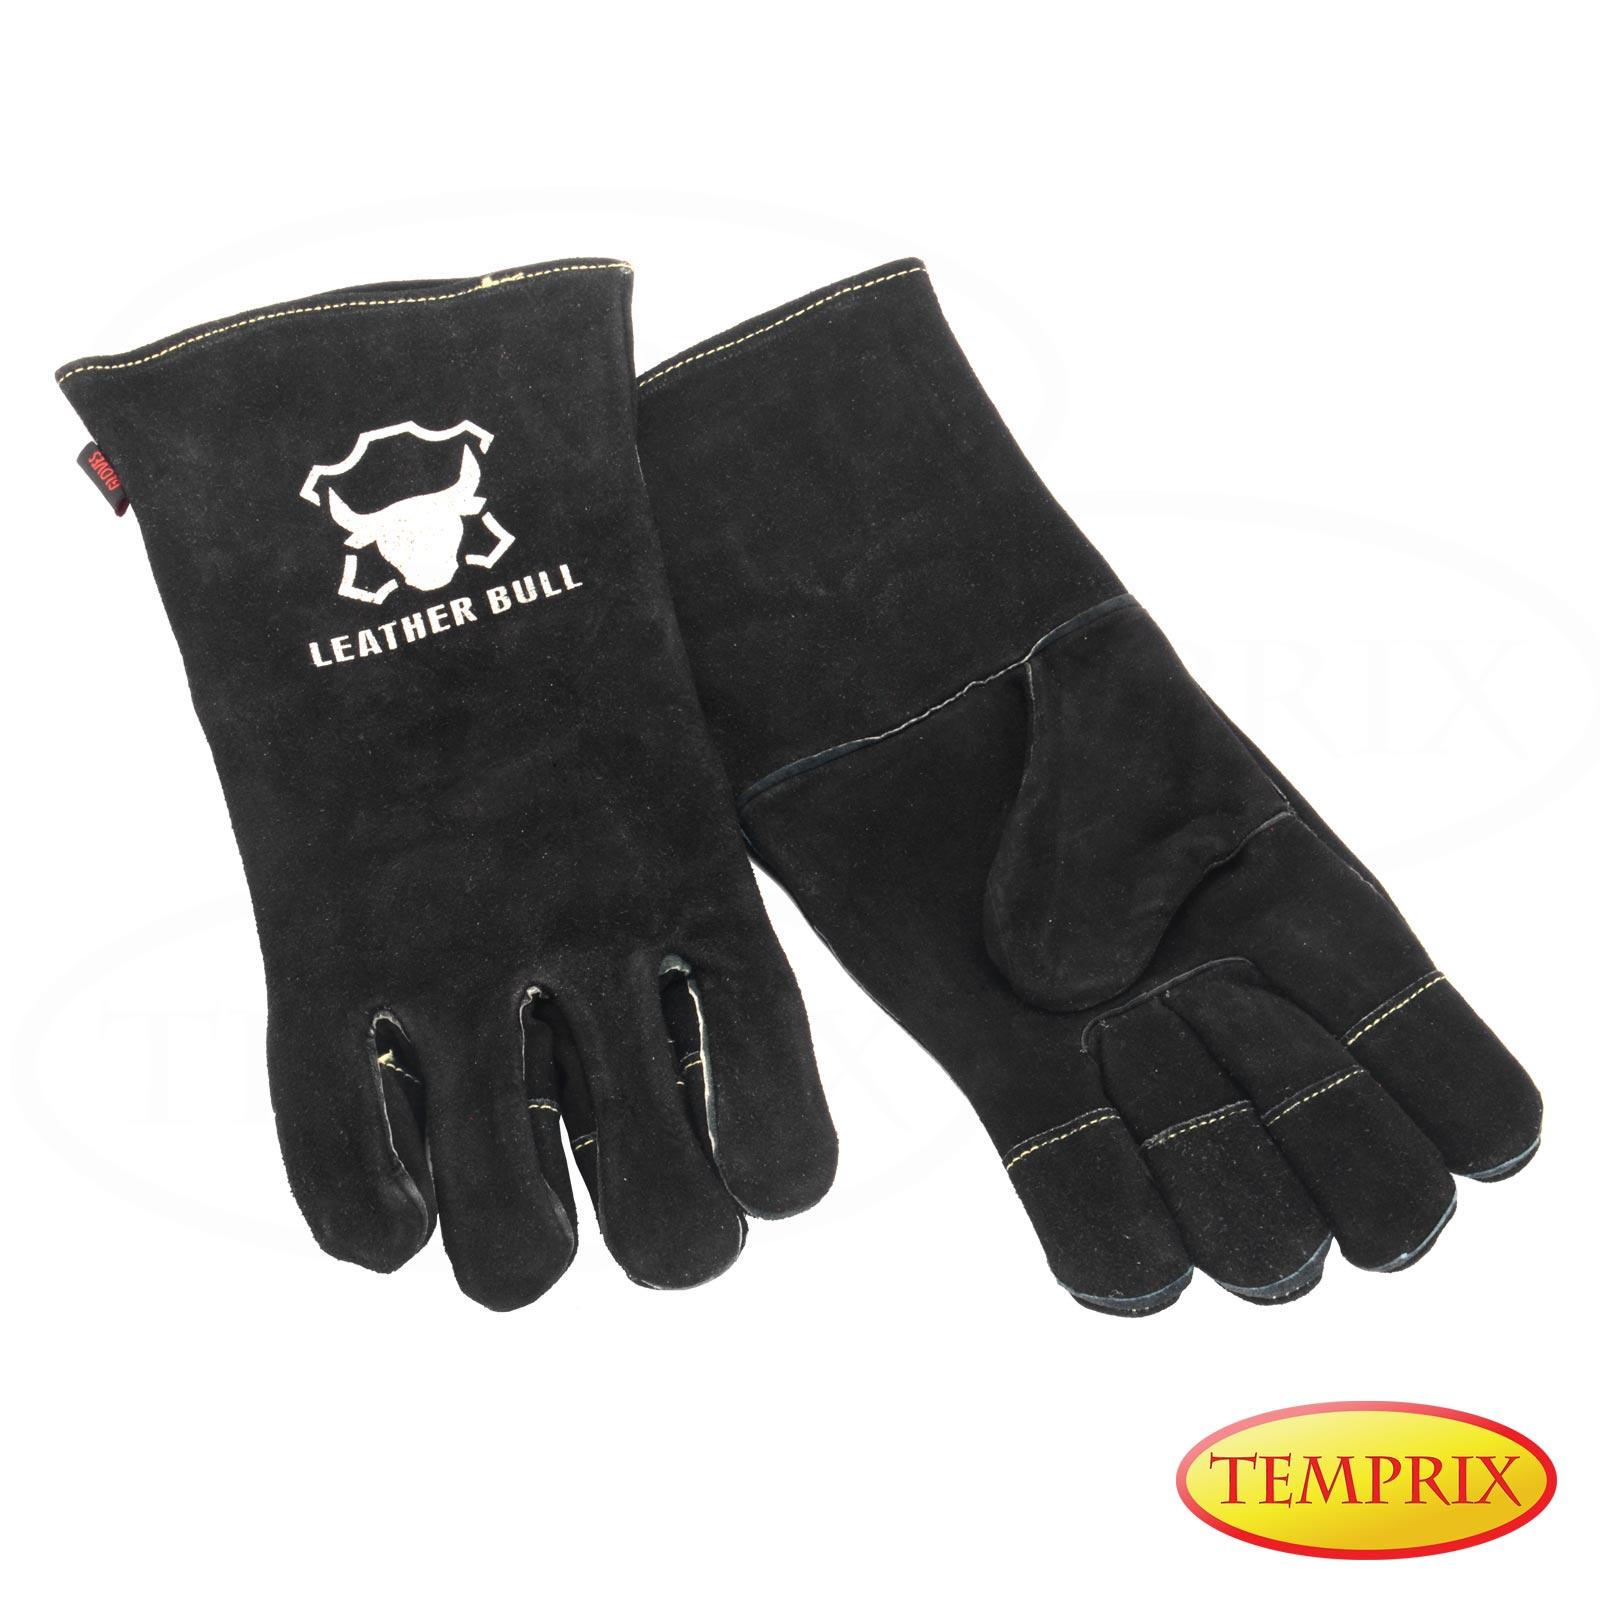 Grillhandschuhe Handschuhe Ofenhandschuhe Kamin Hitzebeständig Ofen Leder BBQ S